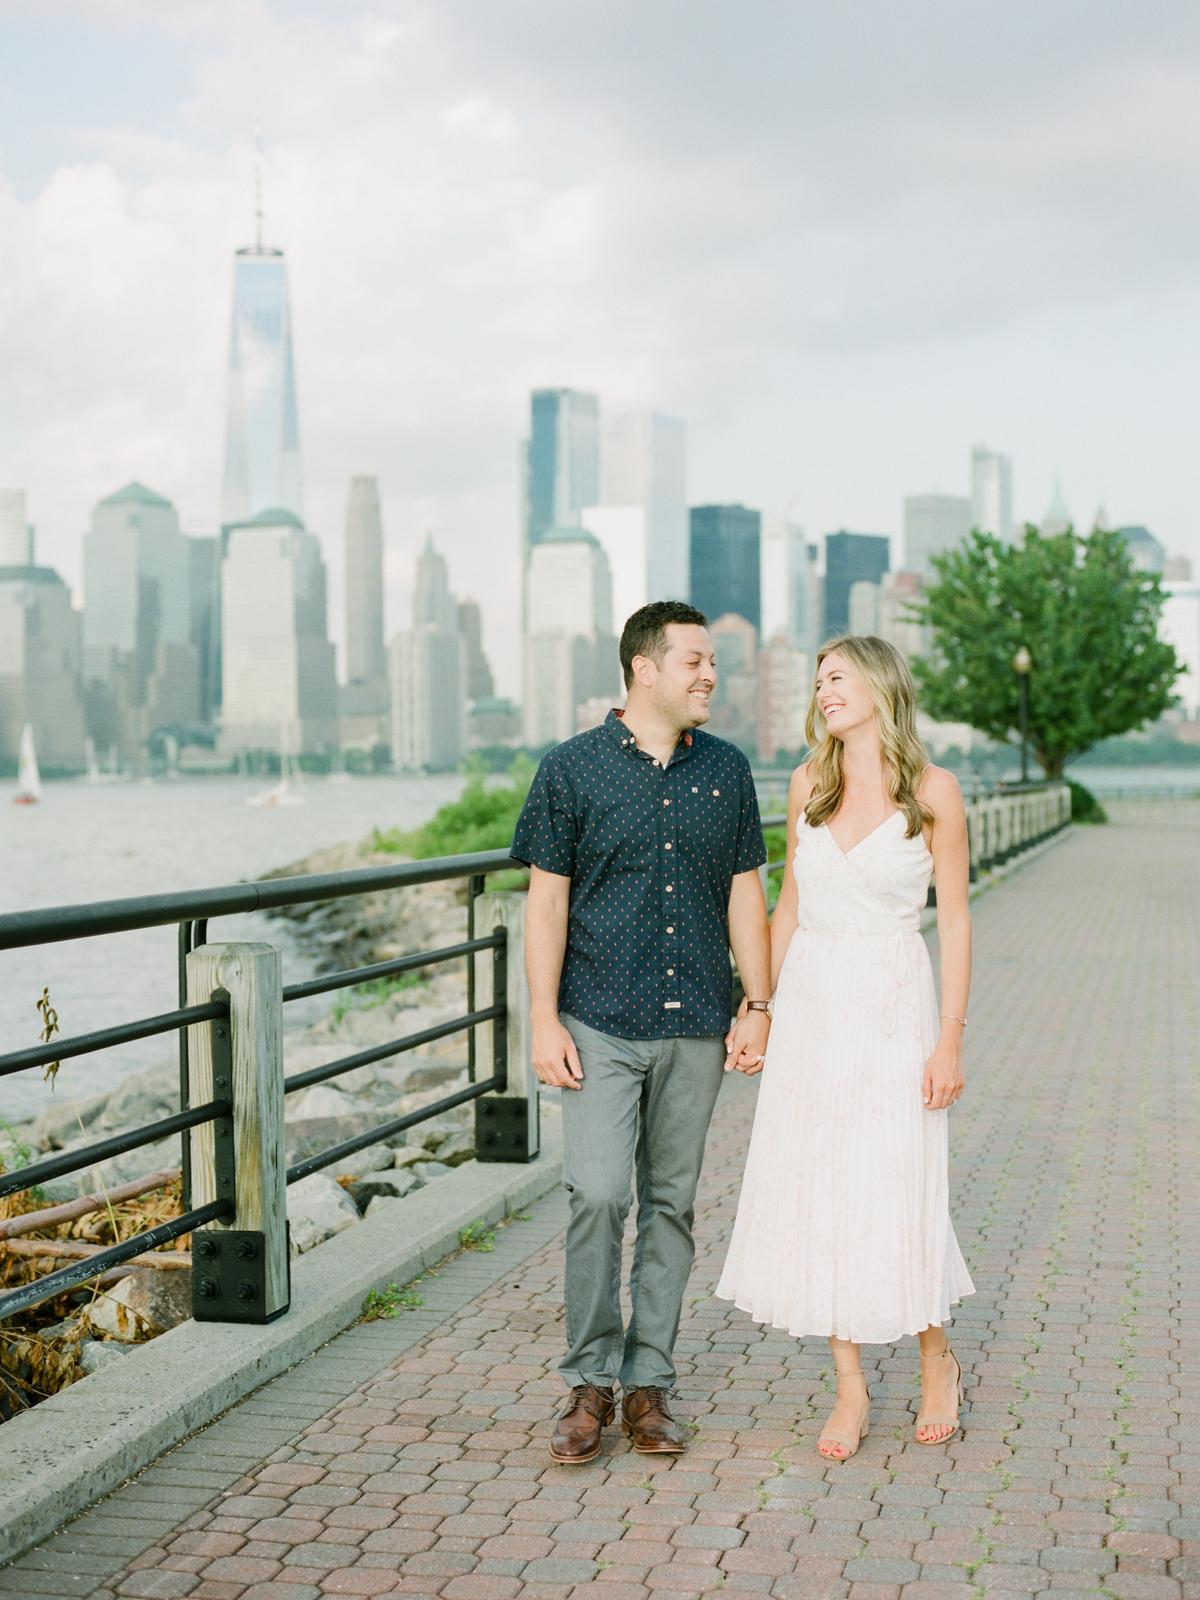 NYC-skyline-engagement-session-by-Tanya Isaeva-6.jpg